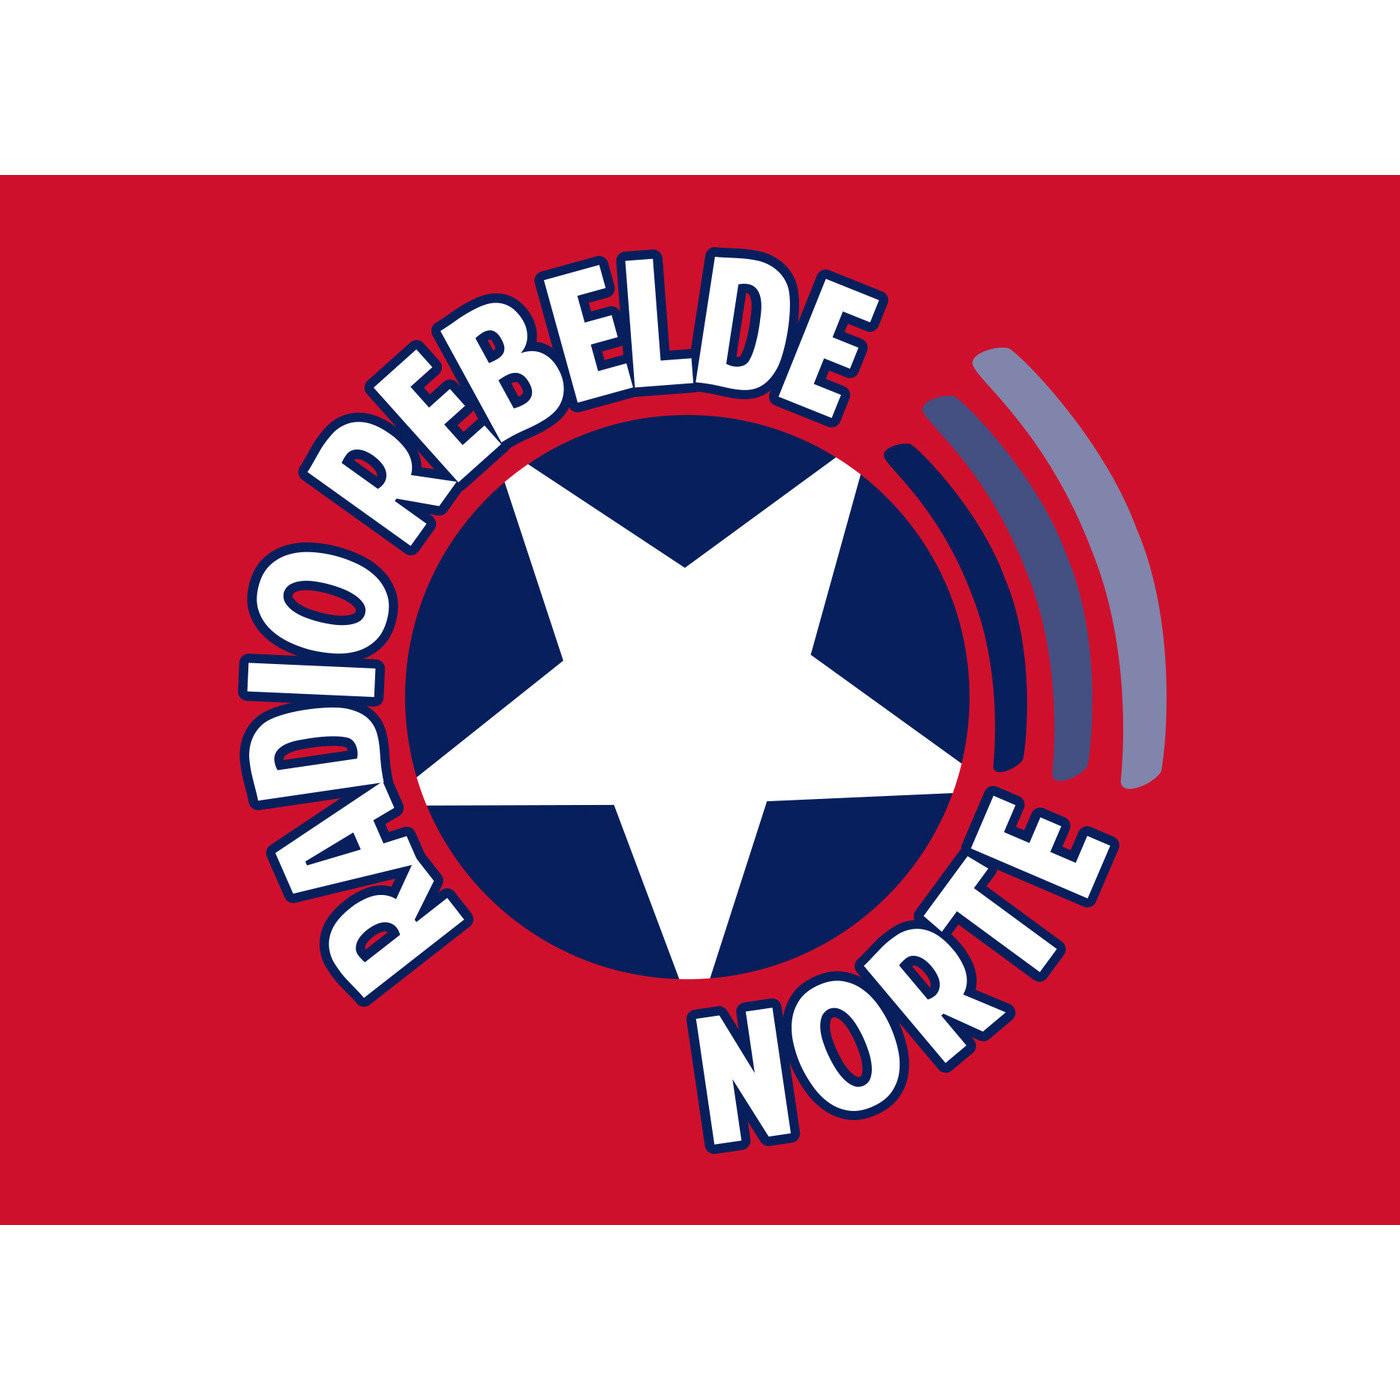 Podcast de Radio Rebelde Norte